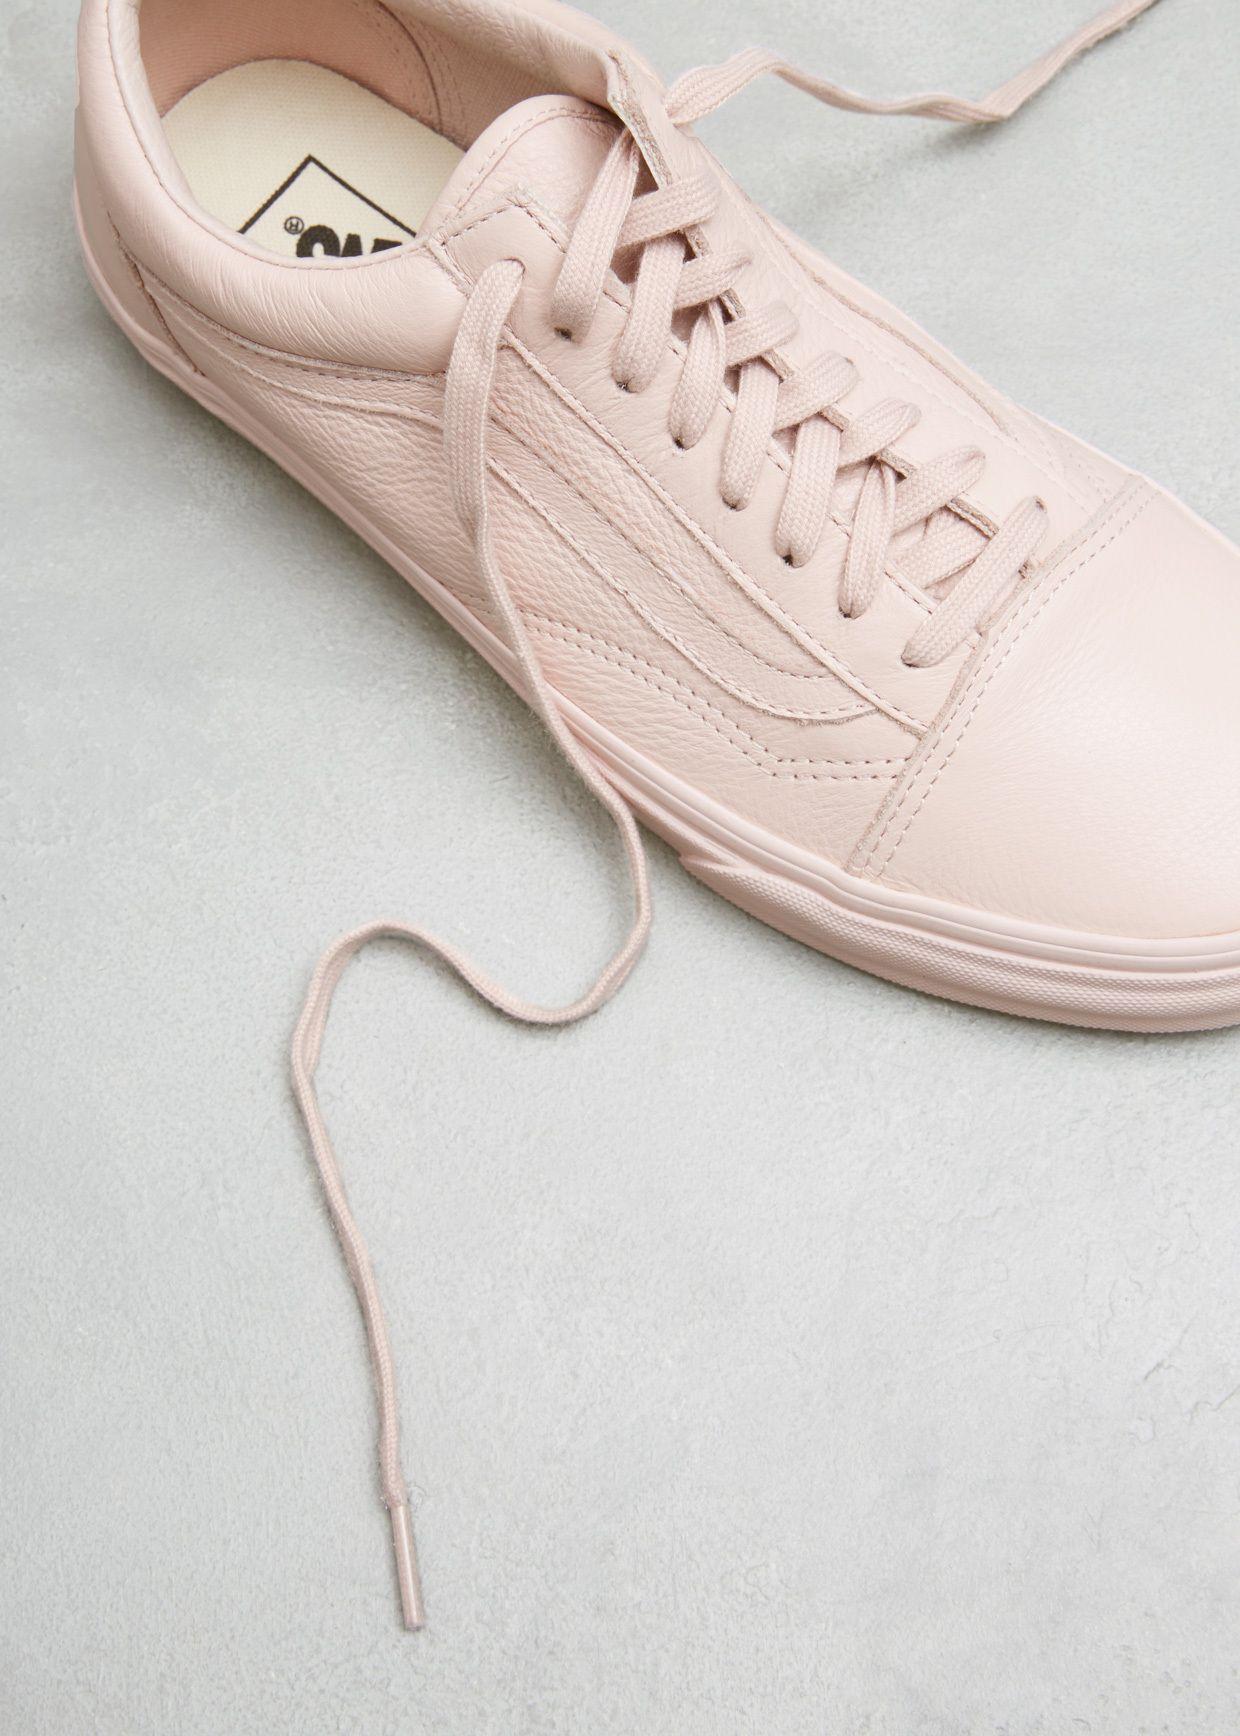 47901e56e01 Vans Women s UA Old Skool (Sepia Rose Mono Leather)